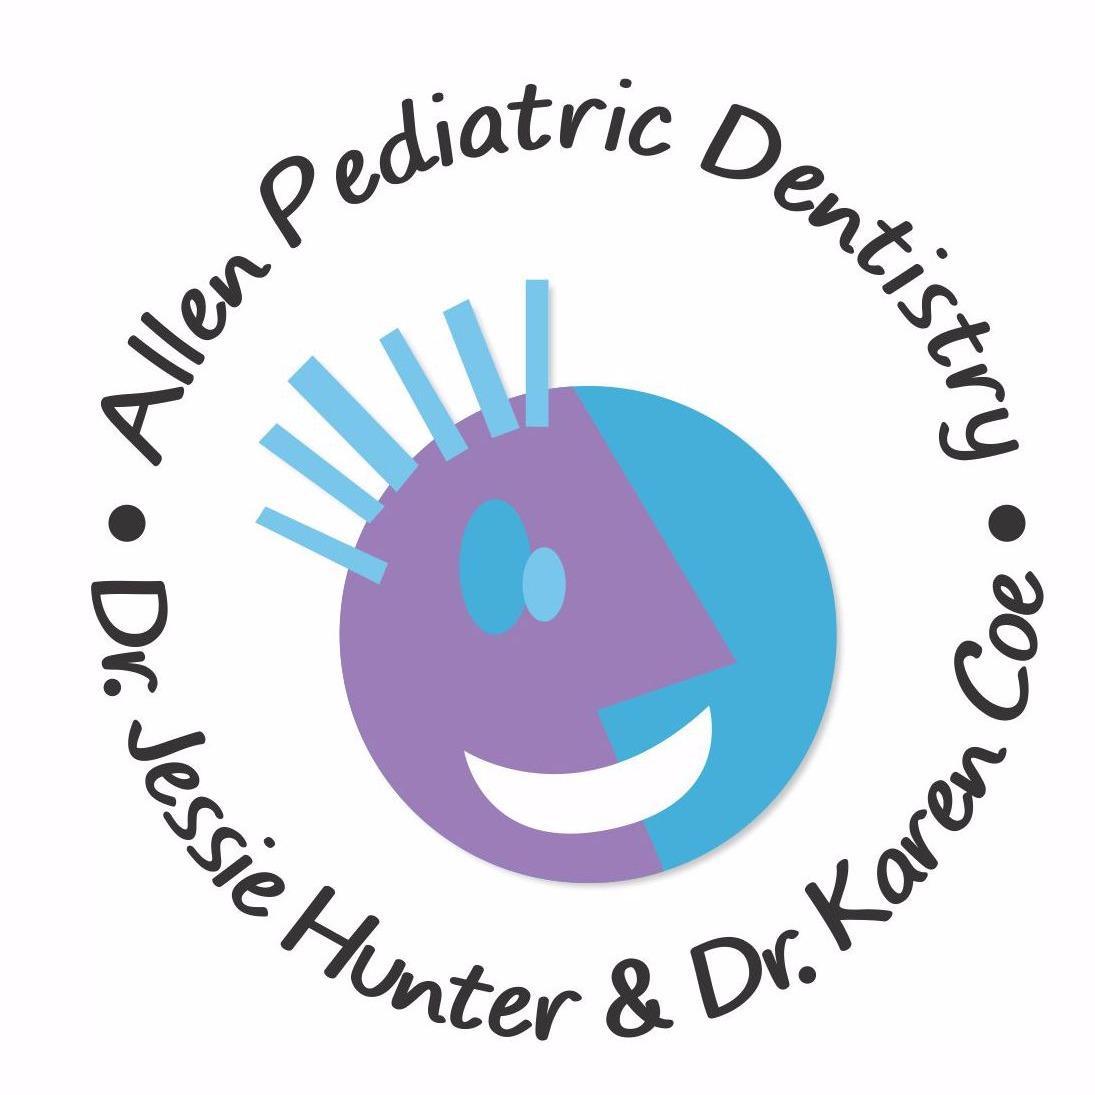 Allen Pediatric Dentistry